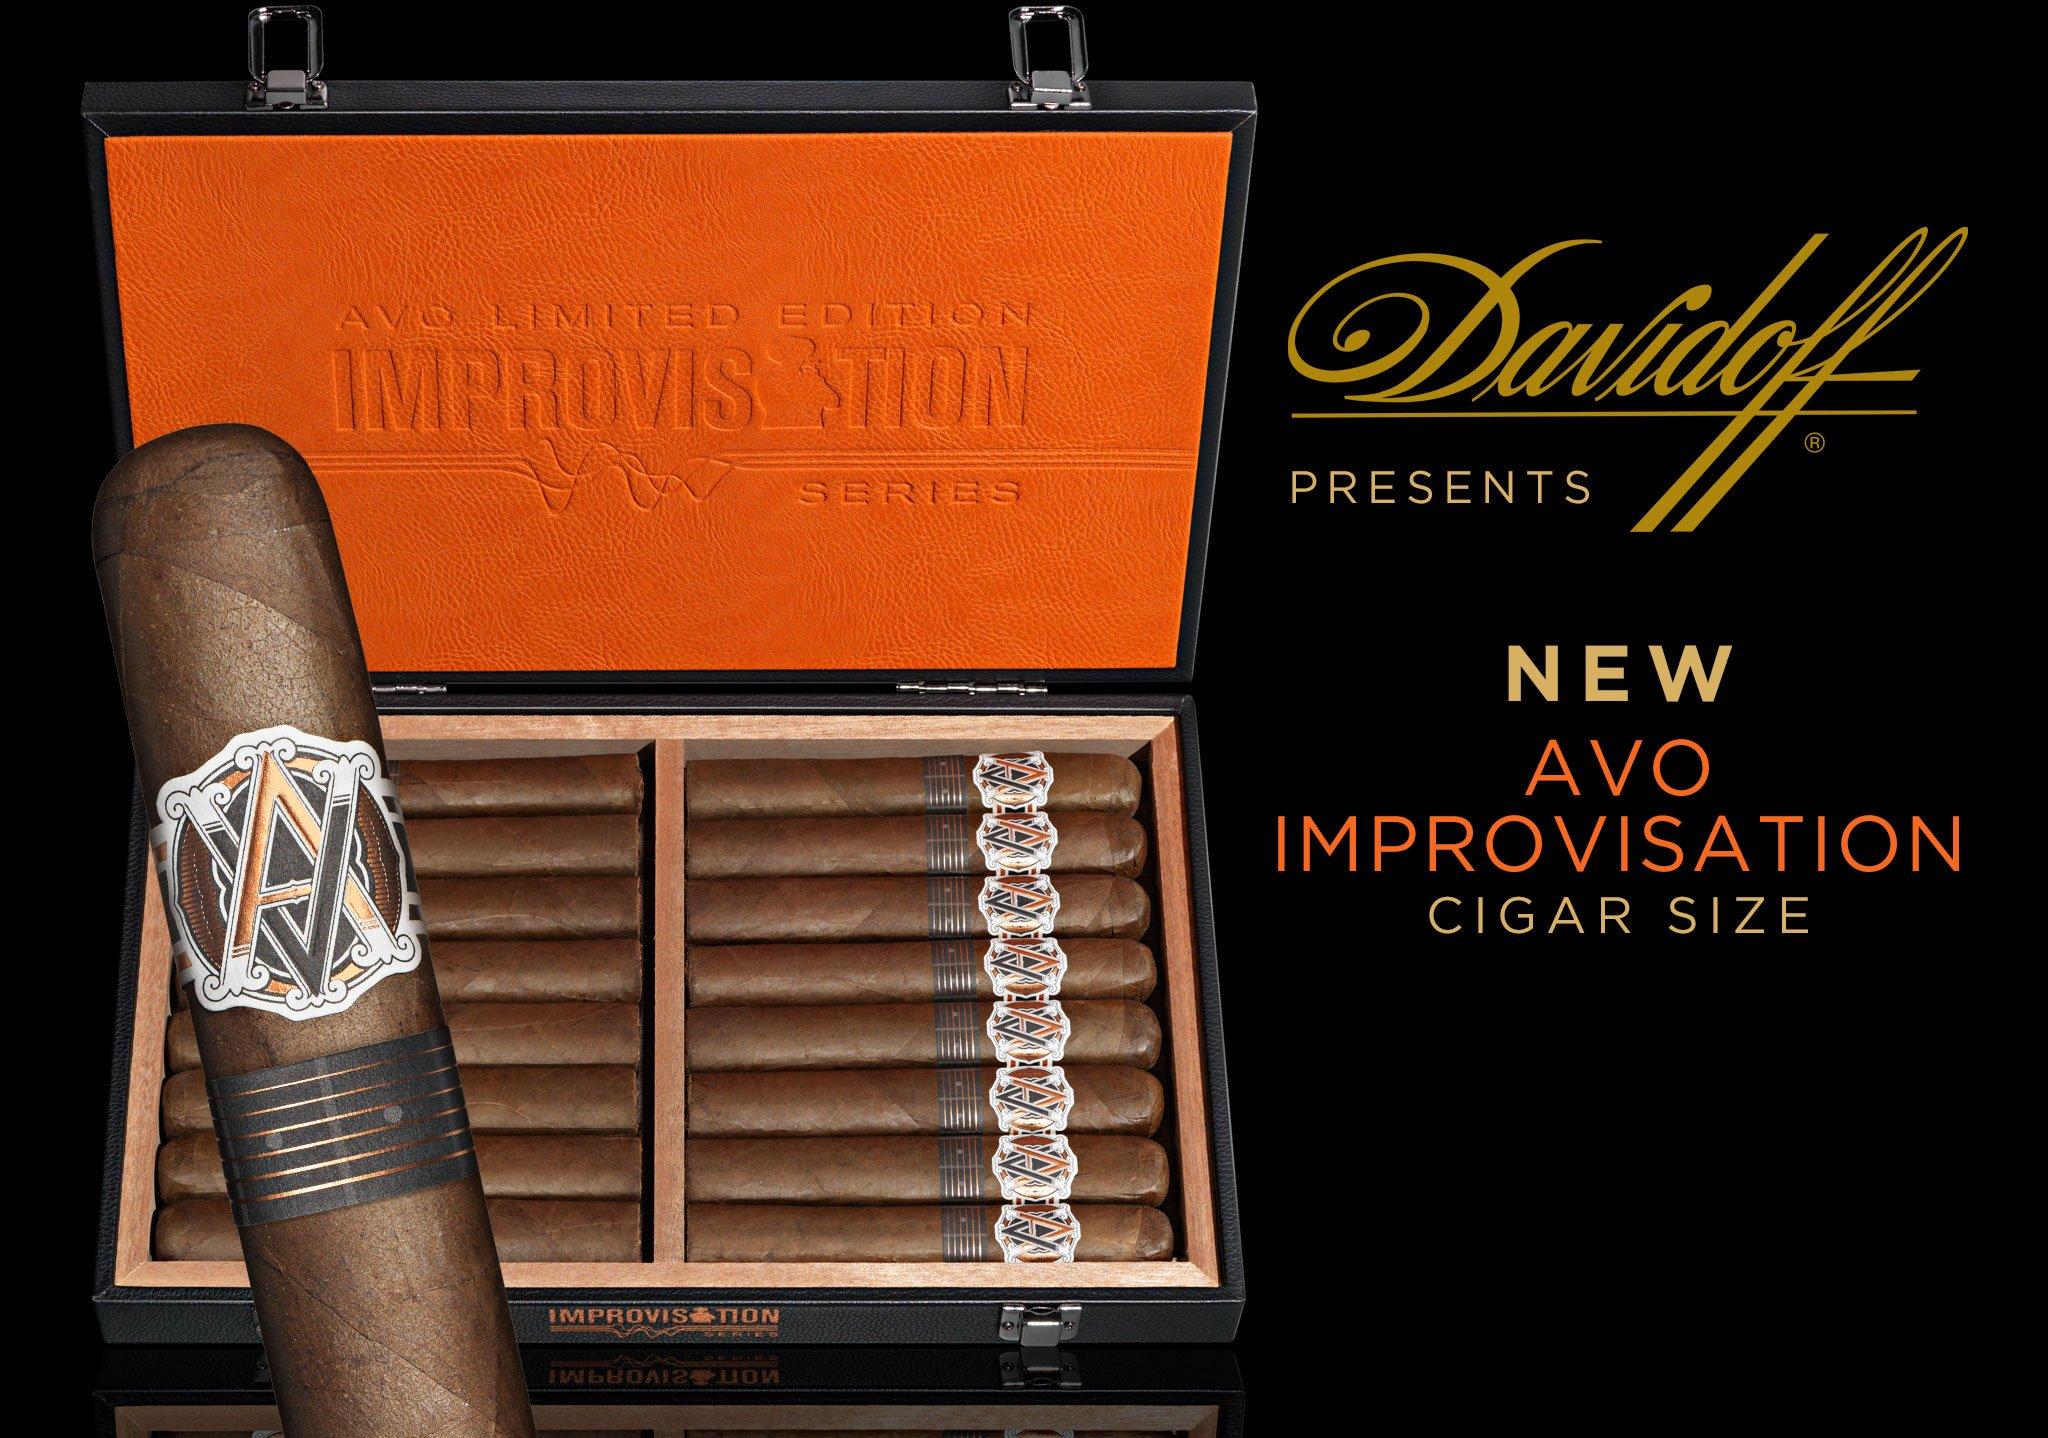 Davidoff Presents New AVO Improvisation LE17 Cigars